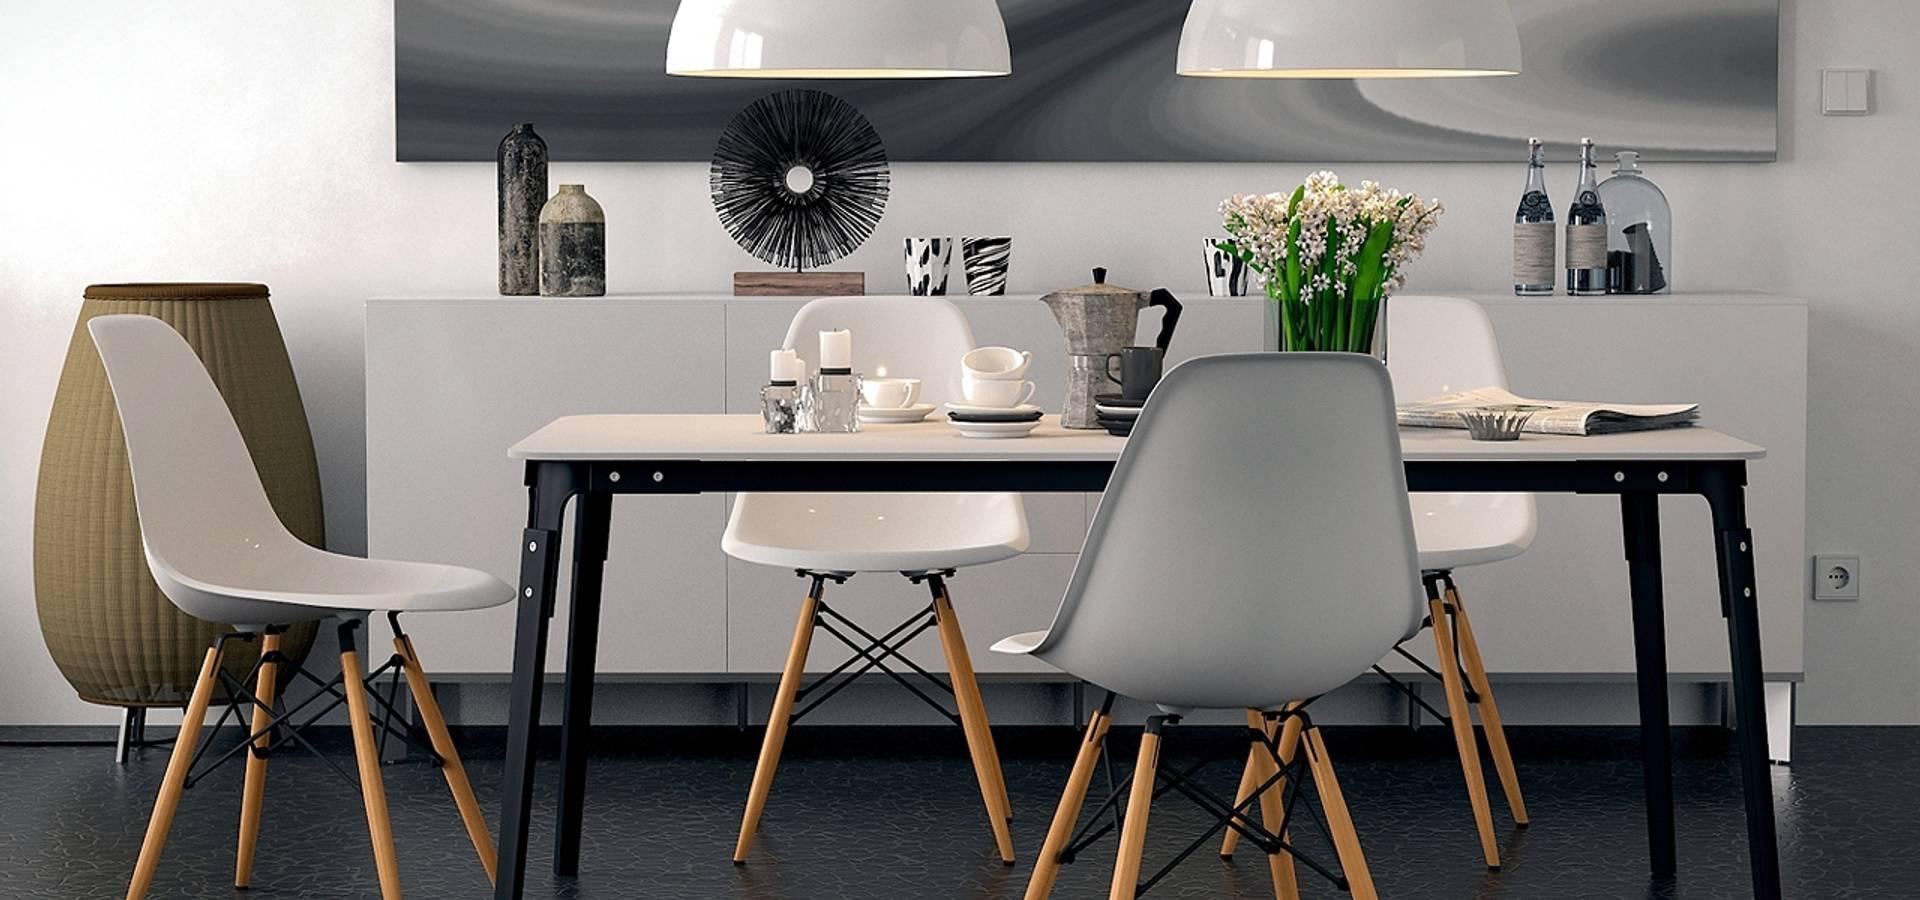 planungsdetail.de GmbH